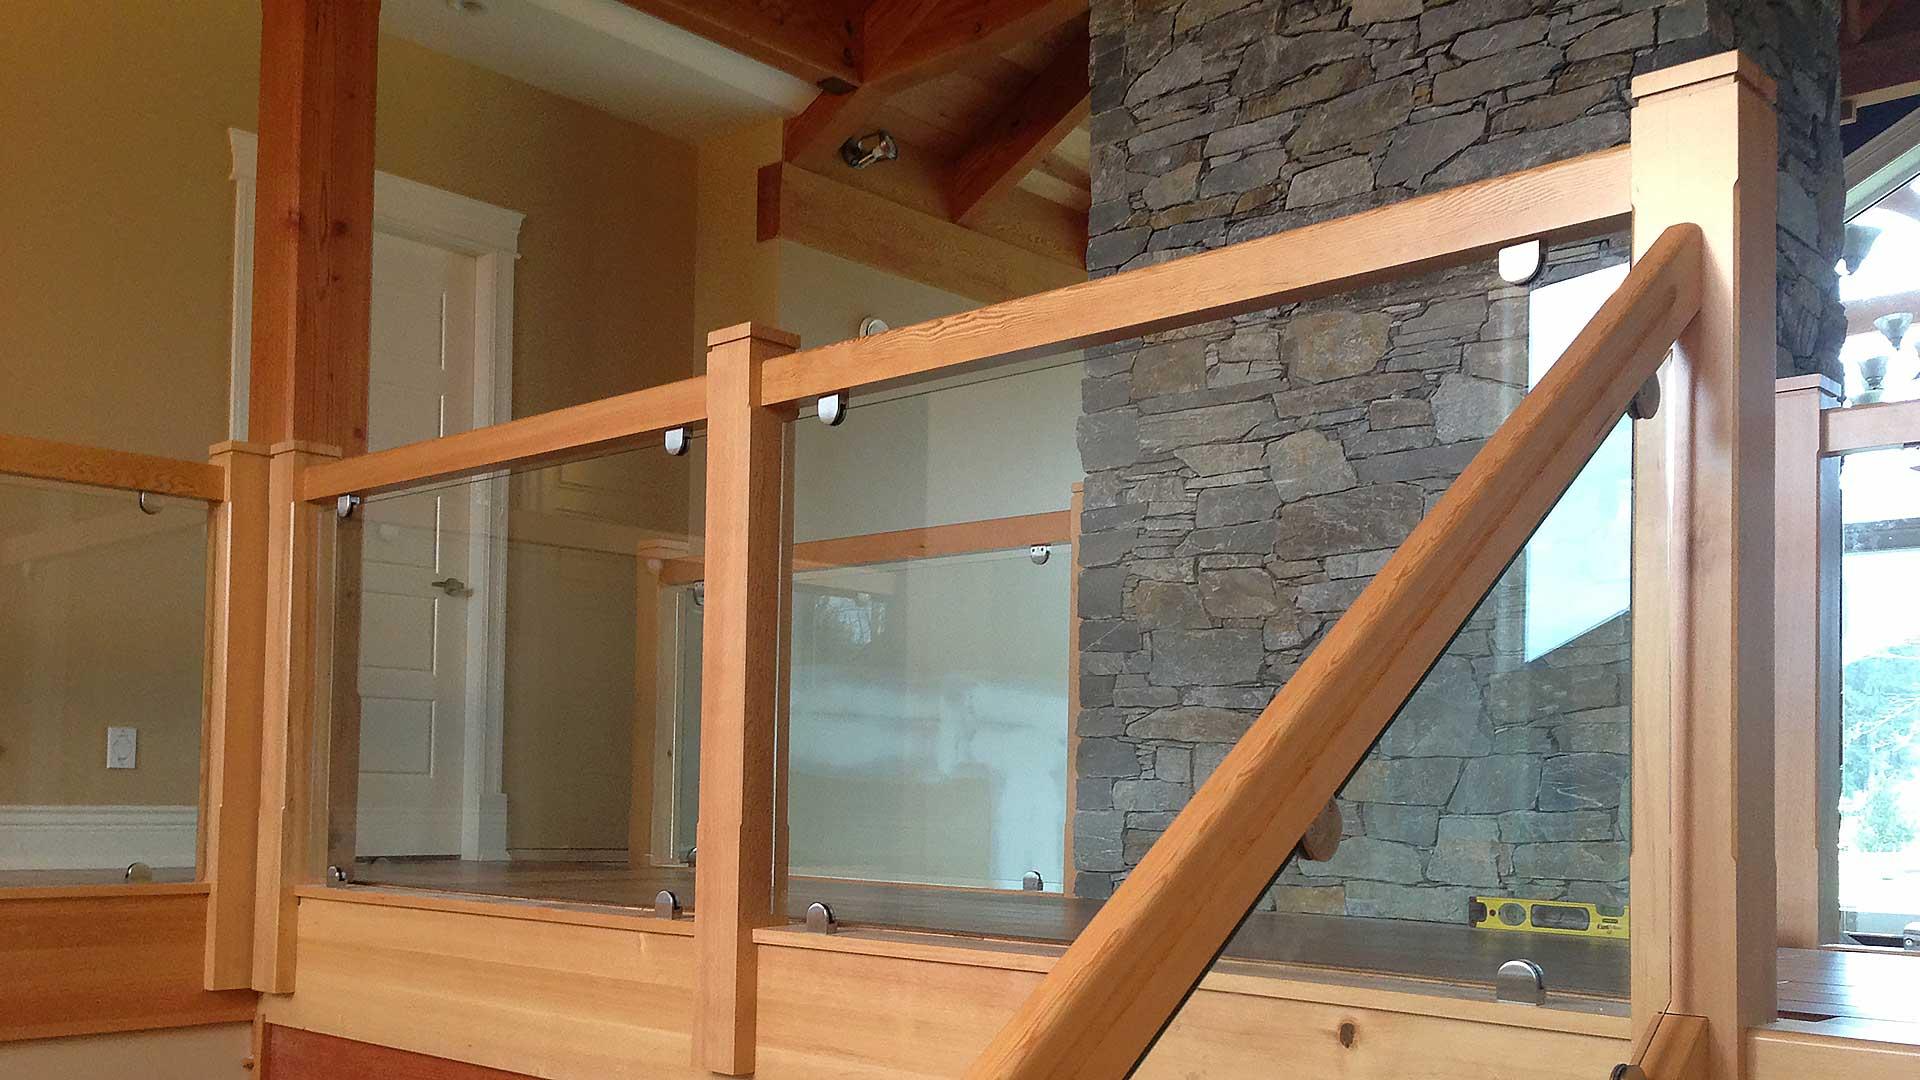 Glass Stair Railings Interior: Custom Timber Stairs And Railings